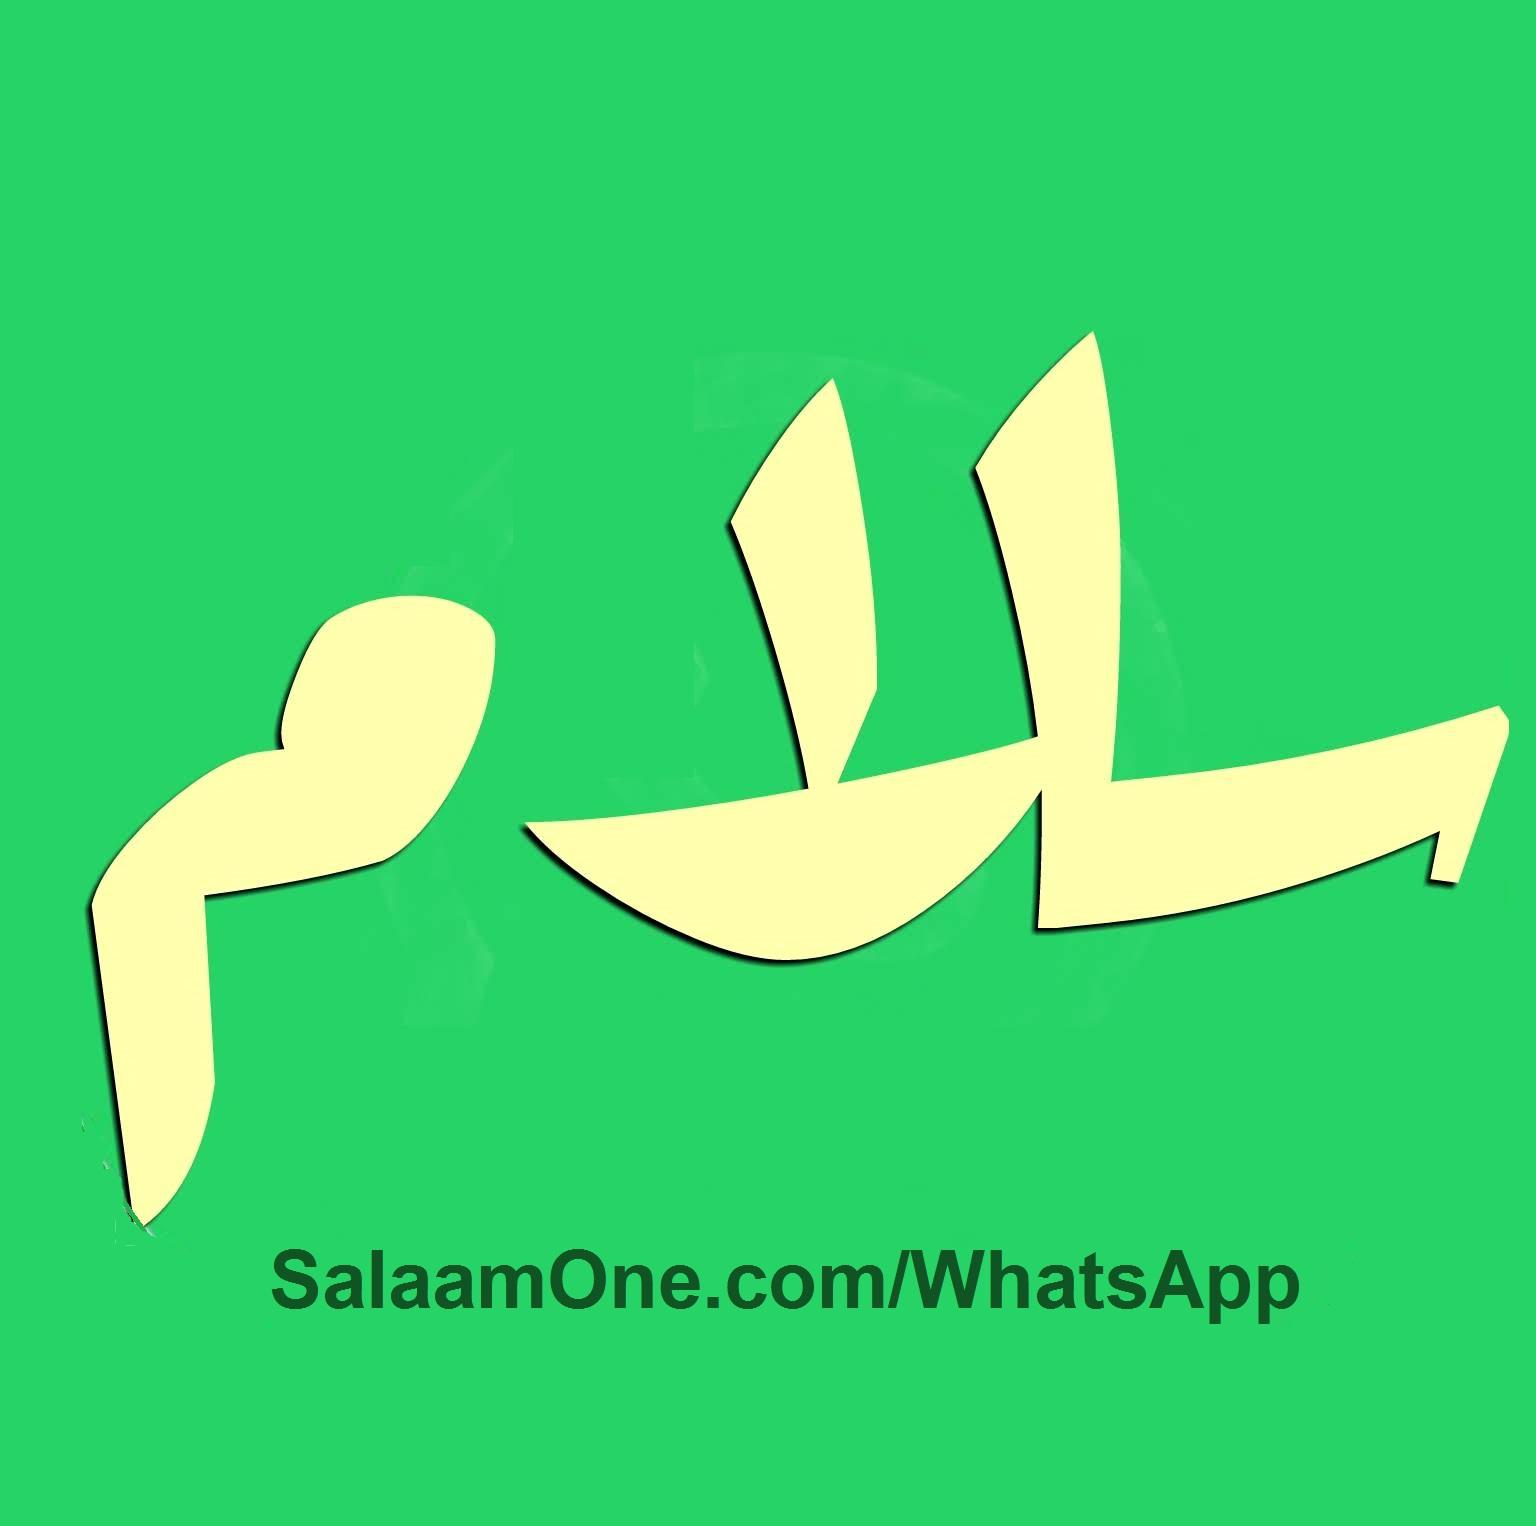 Salaam سلام @ Whats App - Salaam One سلام